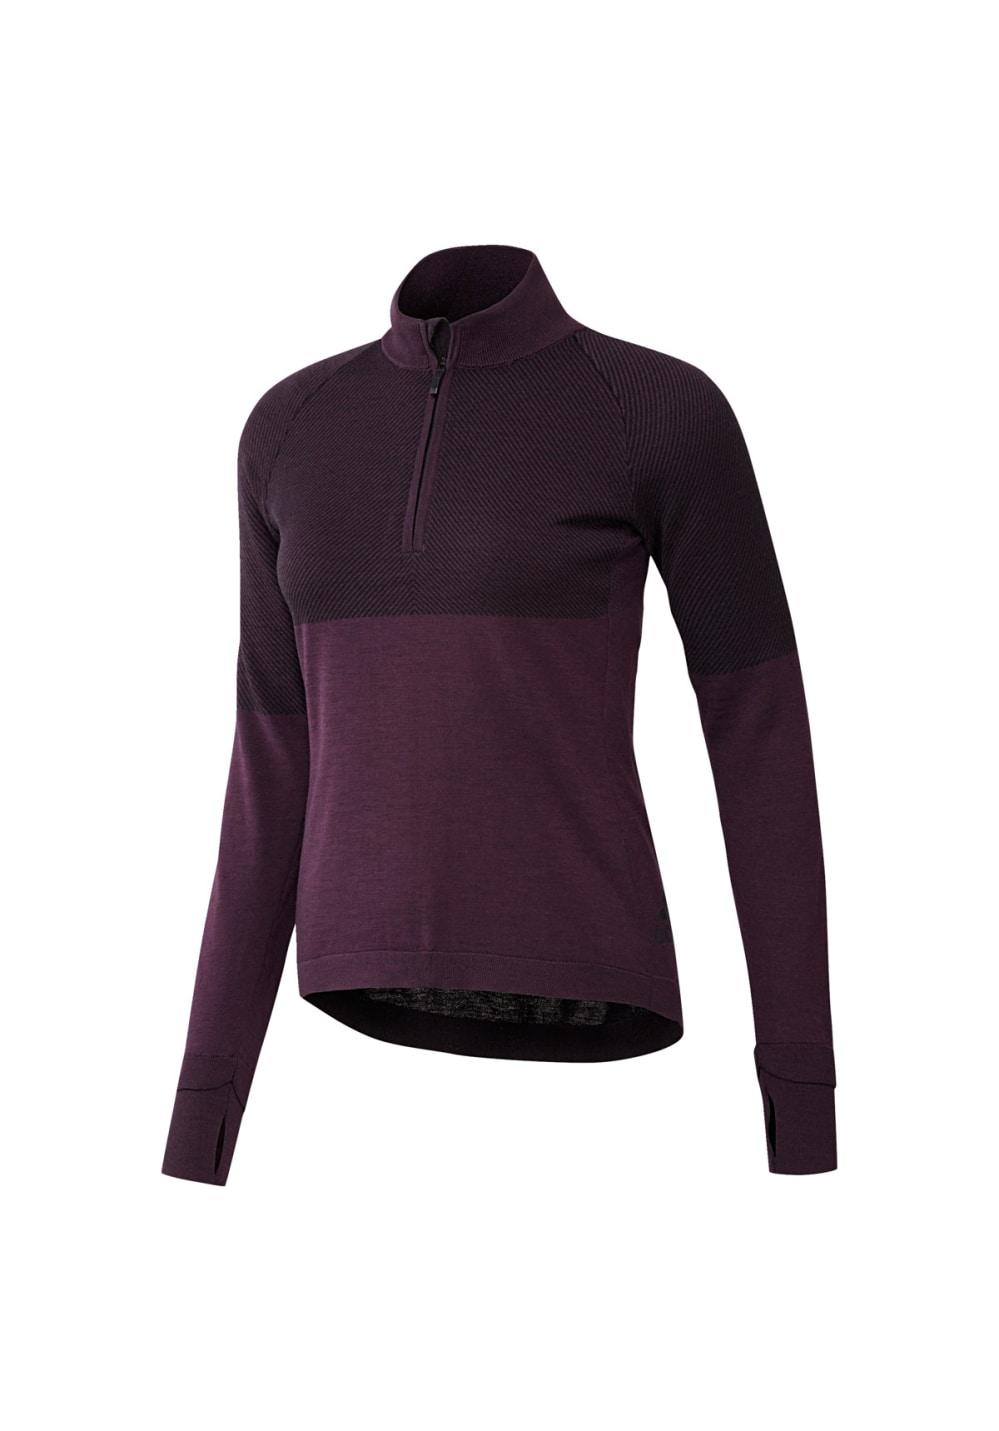 adidas Climaheat Primeknit Jacket - Sweatshirts & Hoodies für Damen - Lila, Gr.